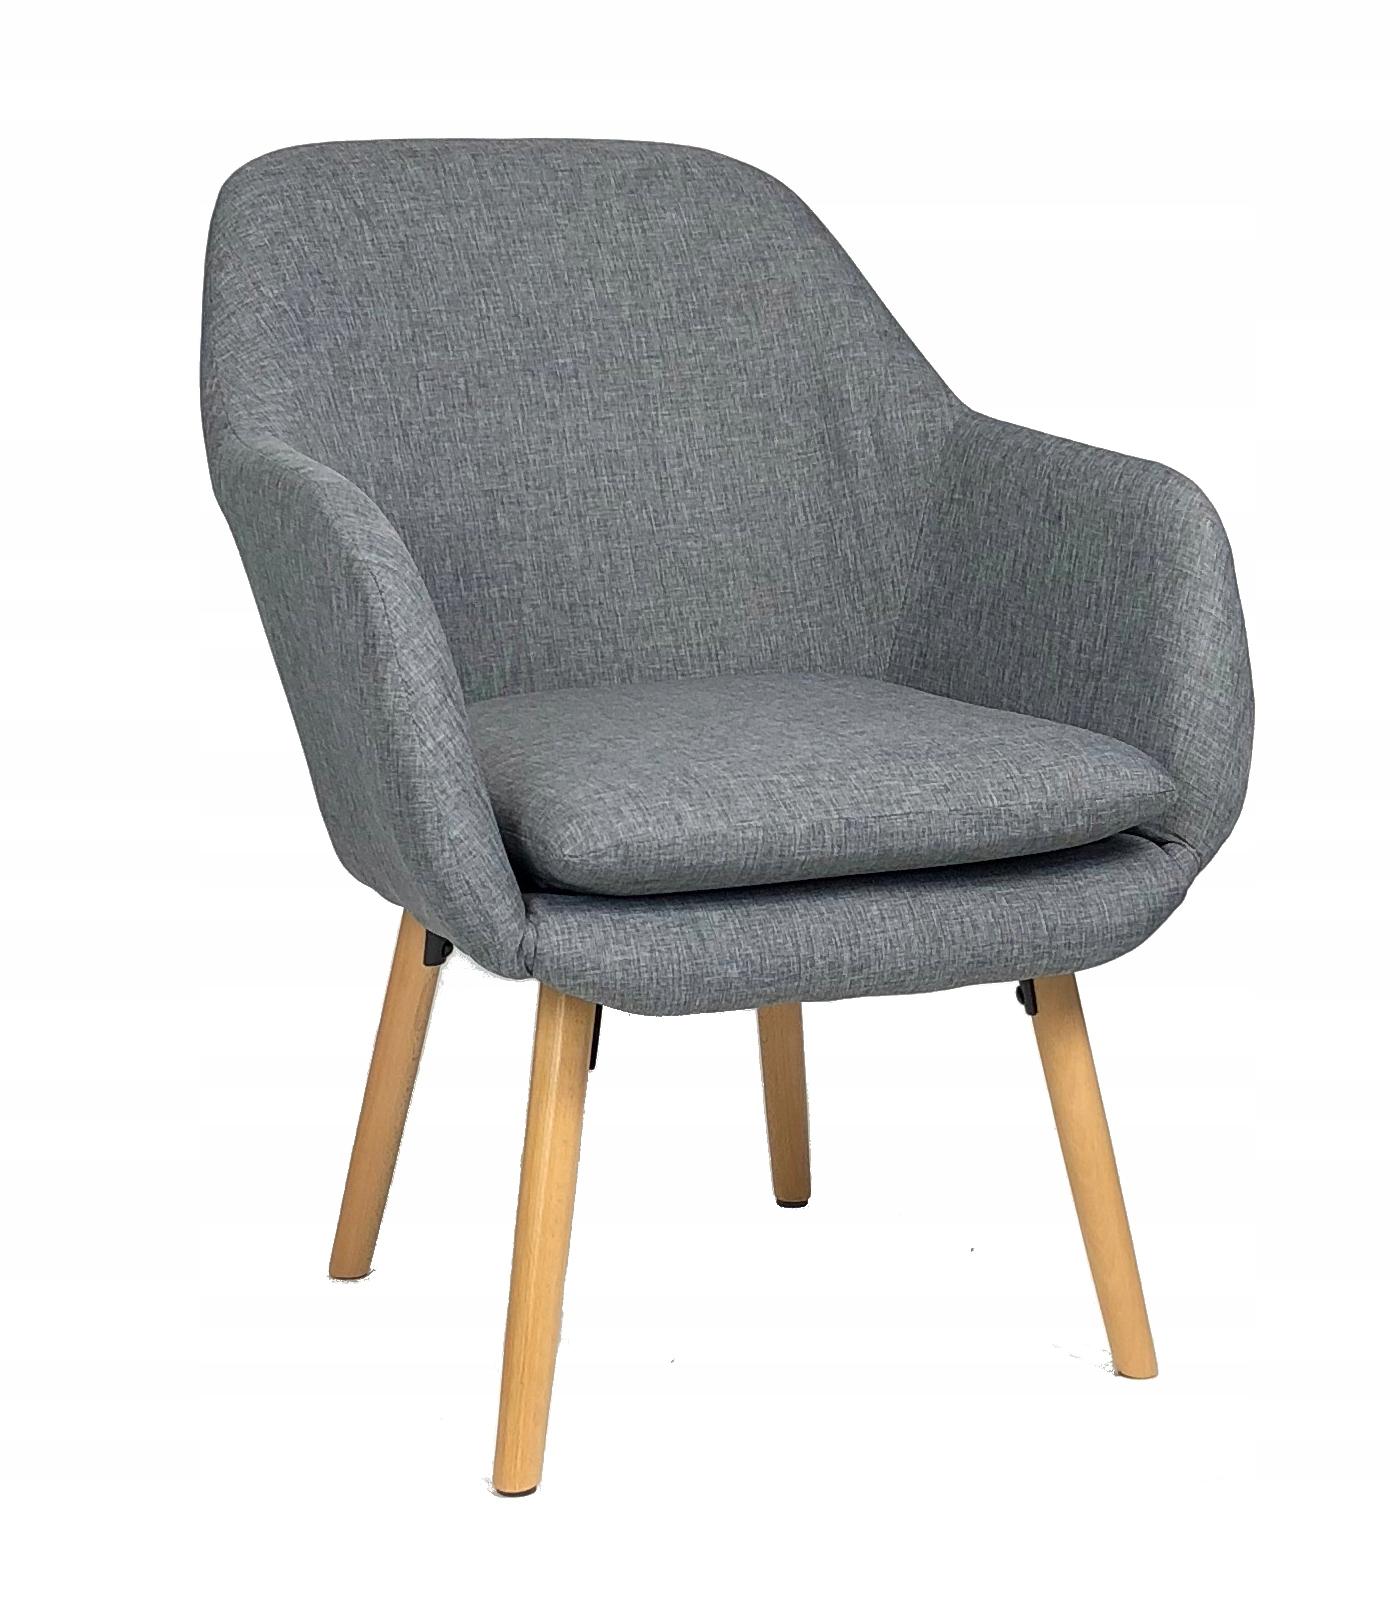 Мягкое кресло Boston grey